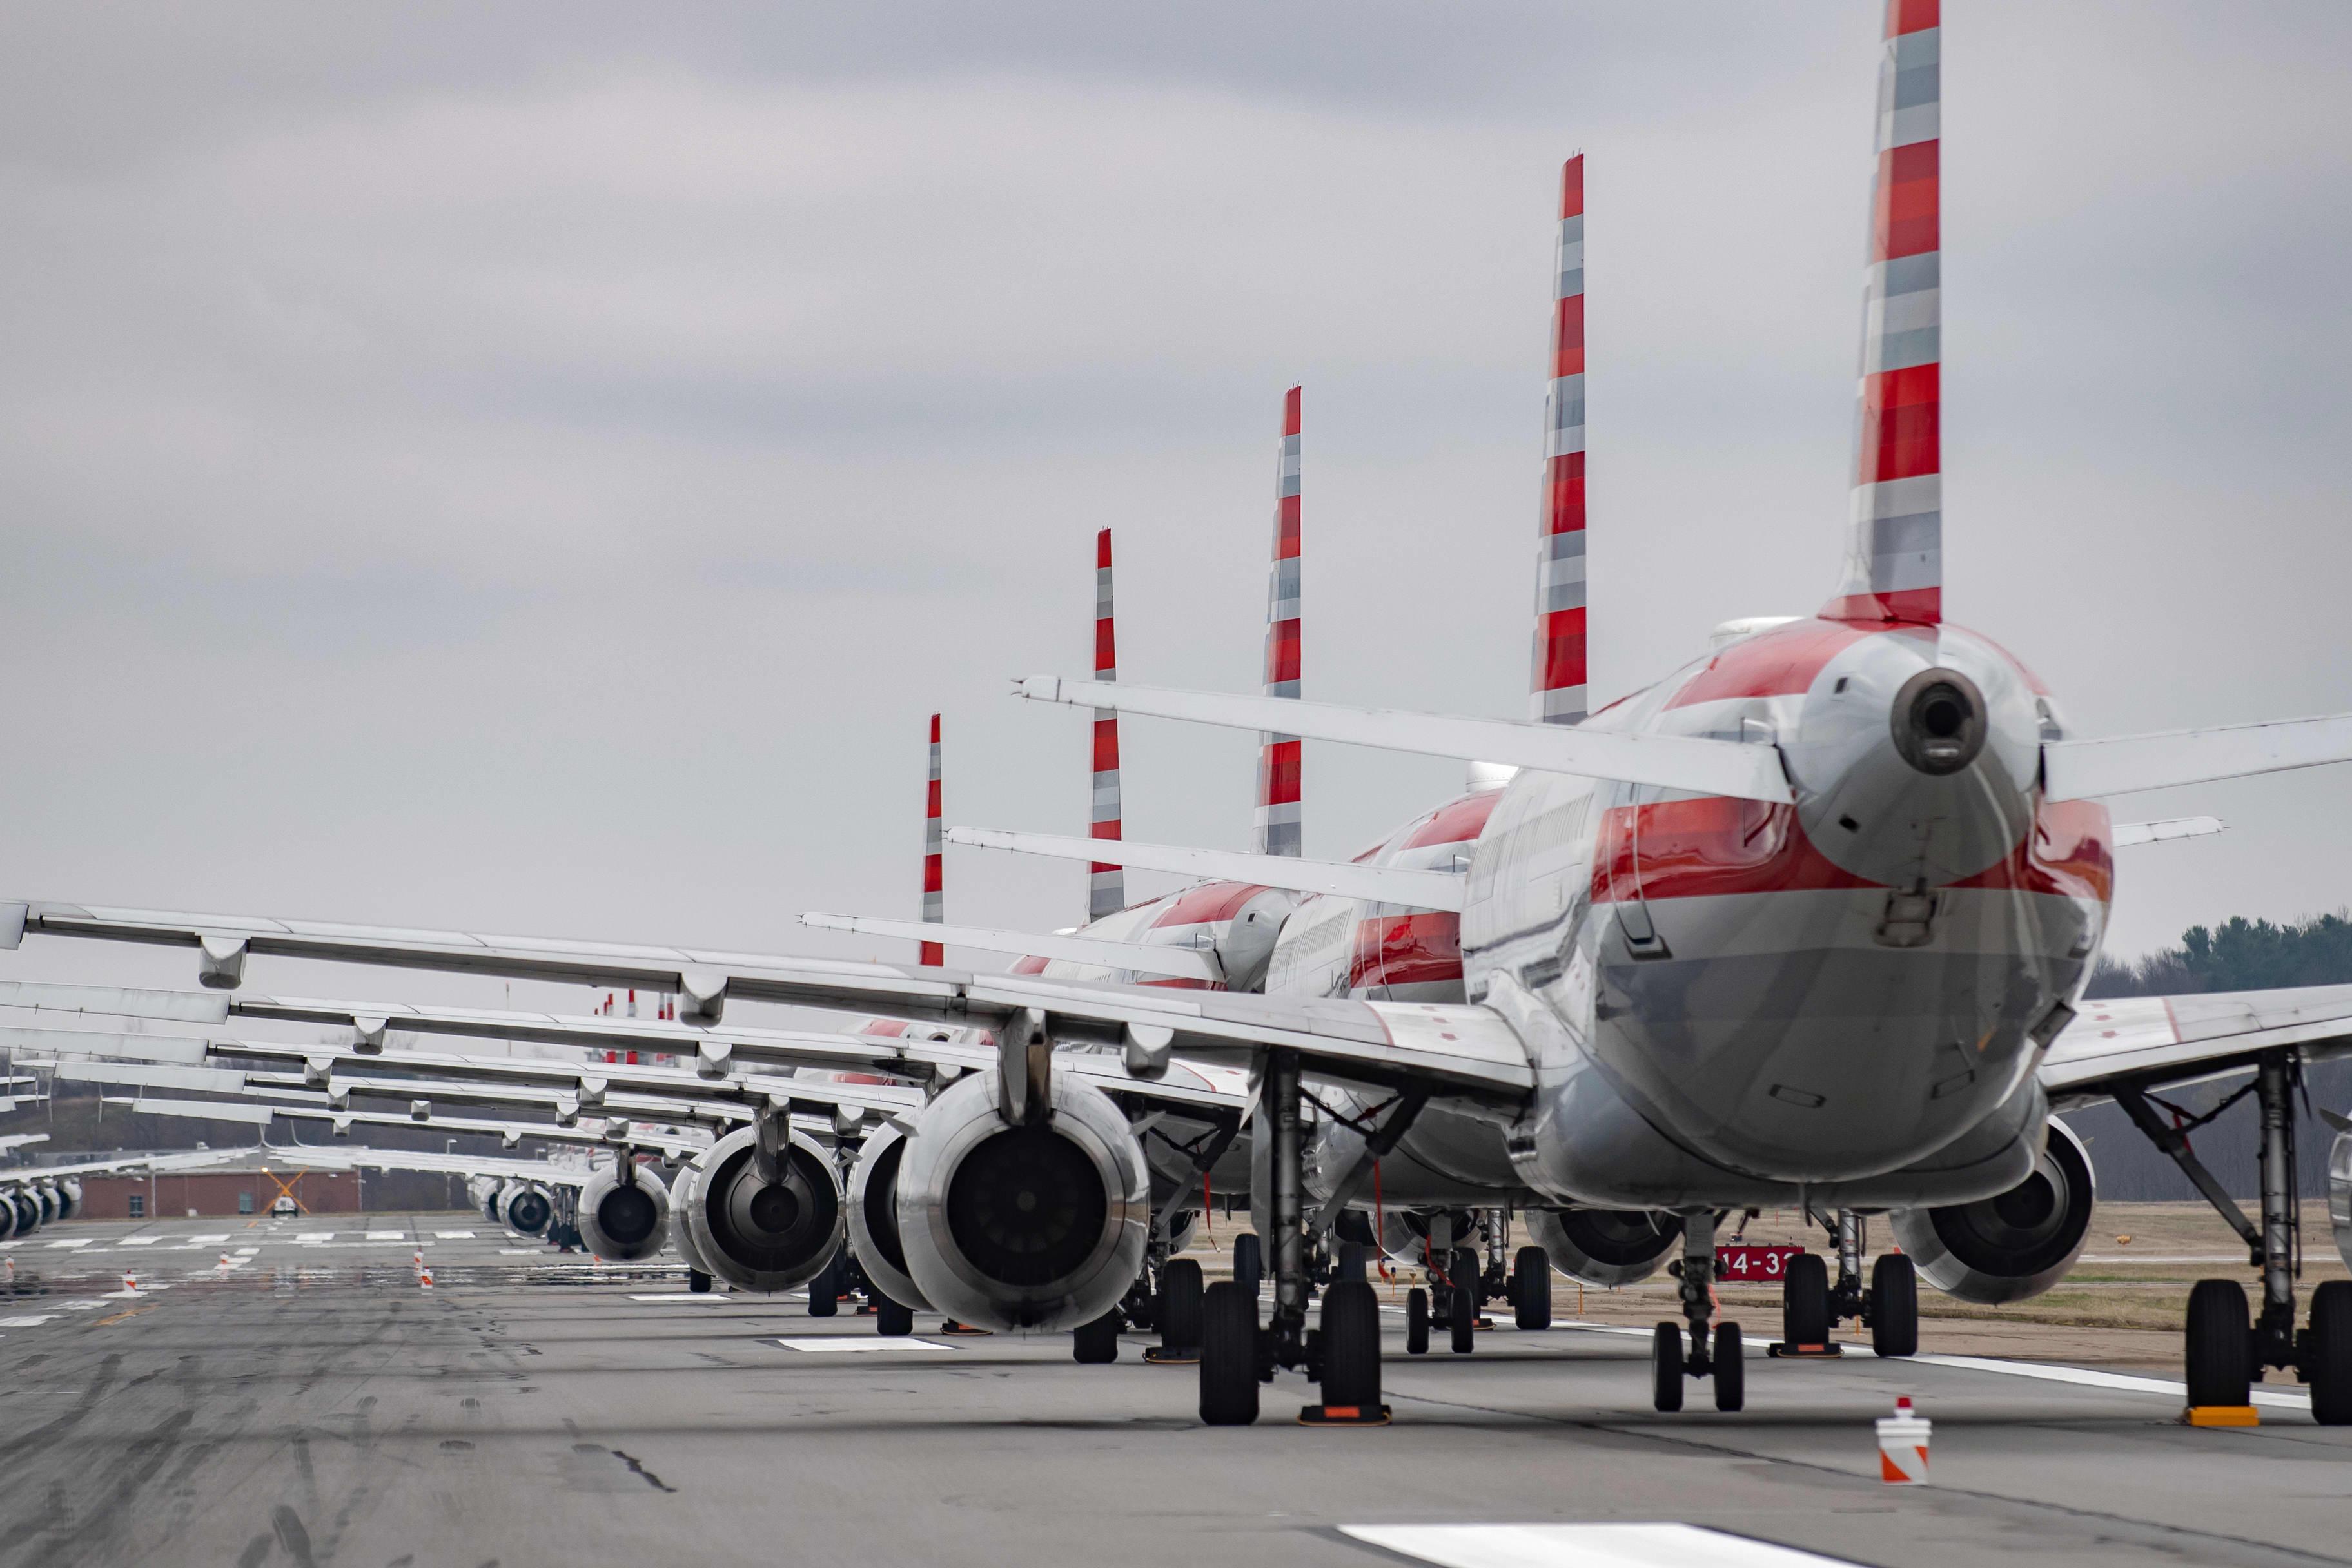 American Airlines coronavirus downgrade: Airline stock 2020 outlook